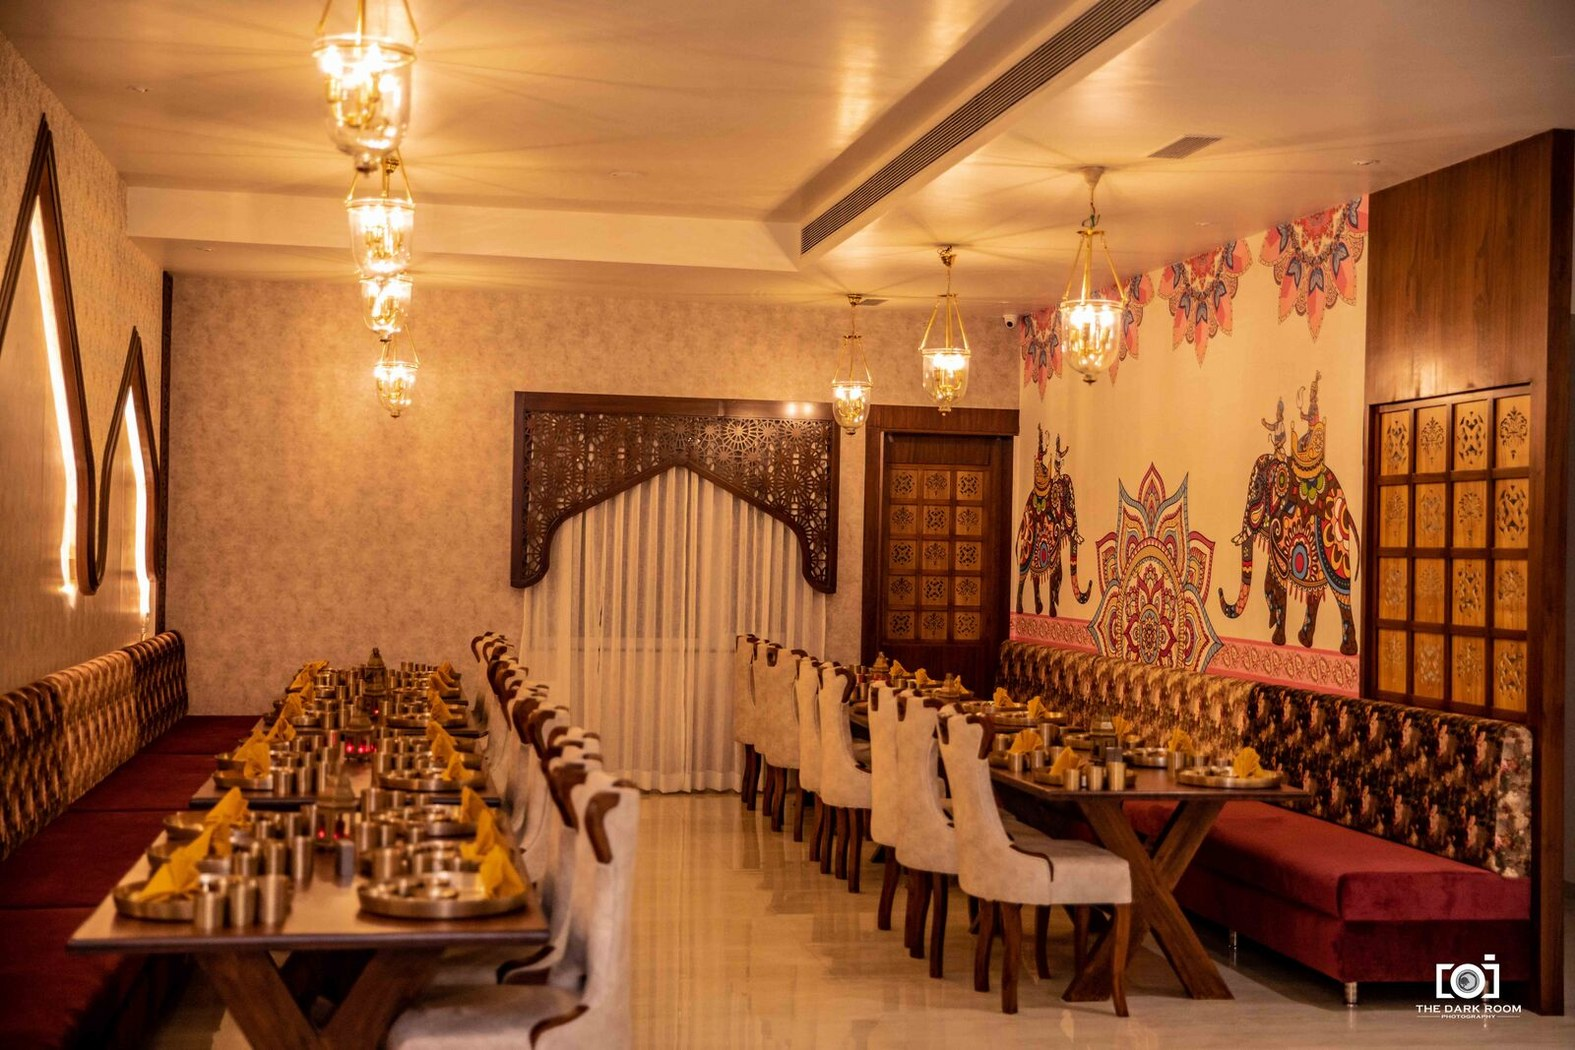 Rajwada The Traditional Style Restaurant In Jabalpur Design Cloud The Architects Diary